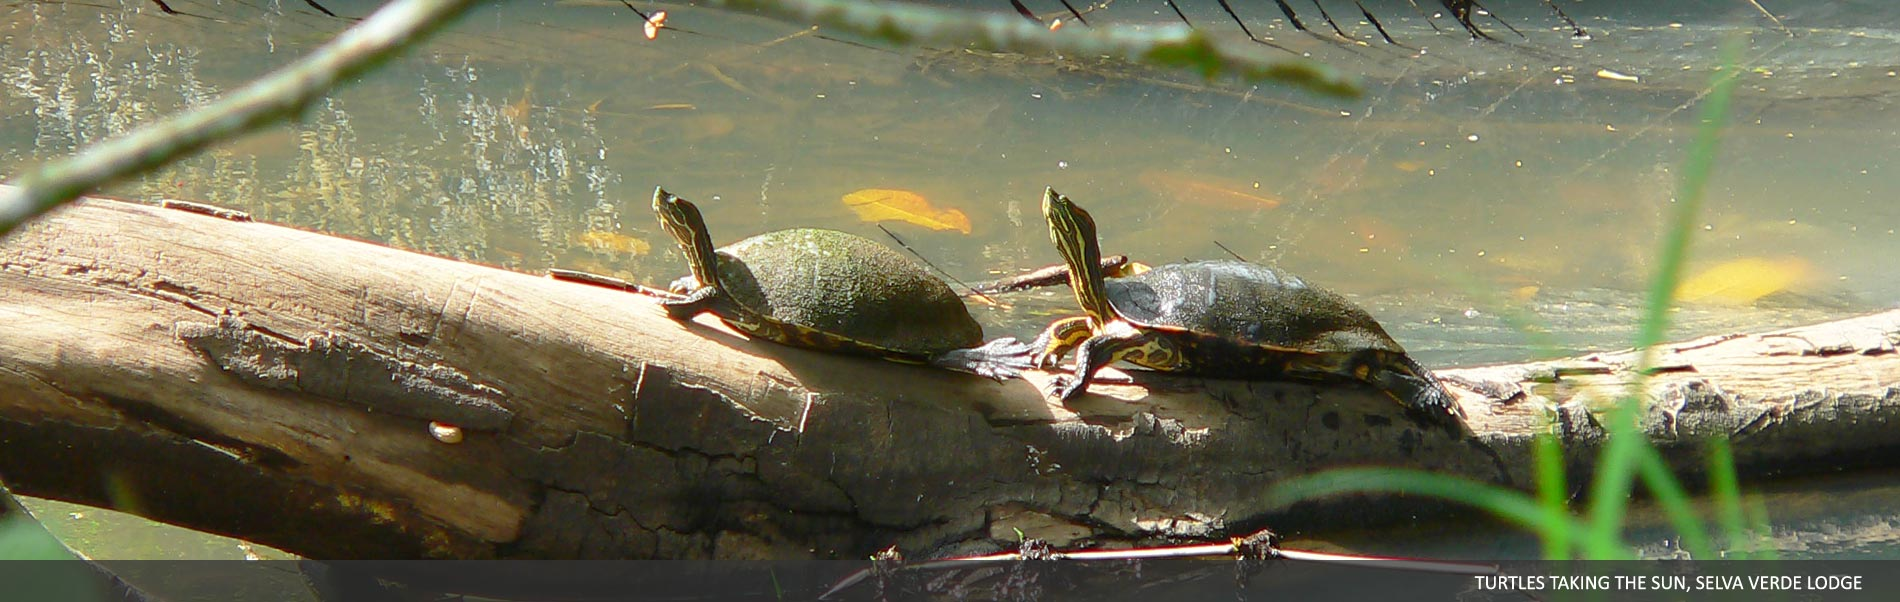 Amphibians-Reptiles-02.jpg